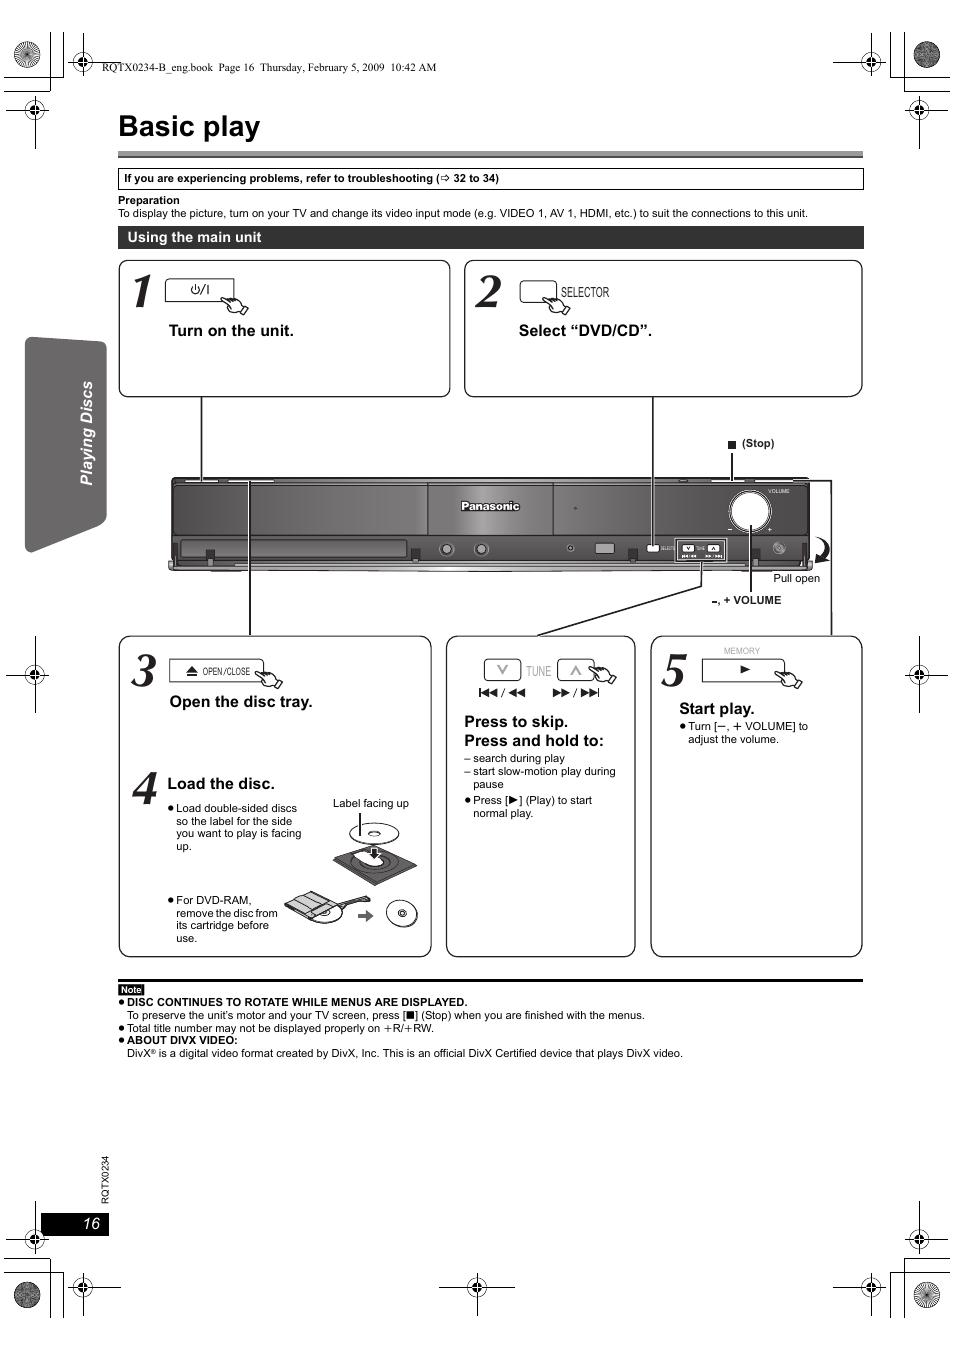 Basic play | Panasonic SC-PT875 User Manual | Page 16 / 40